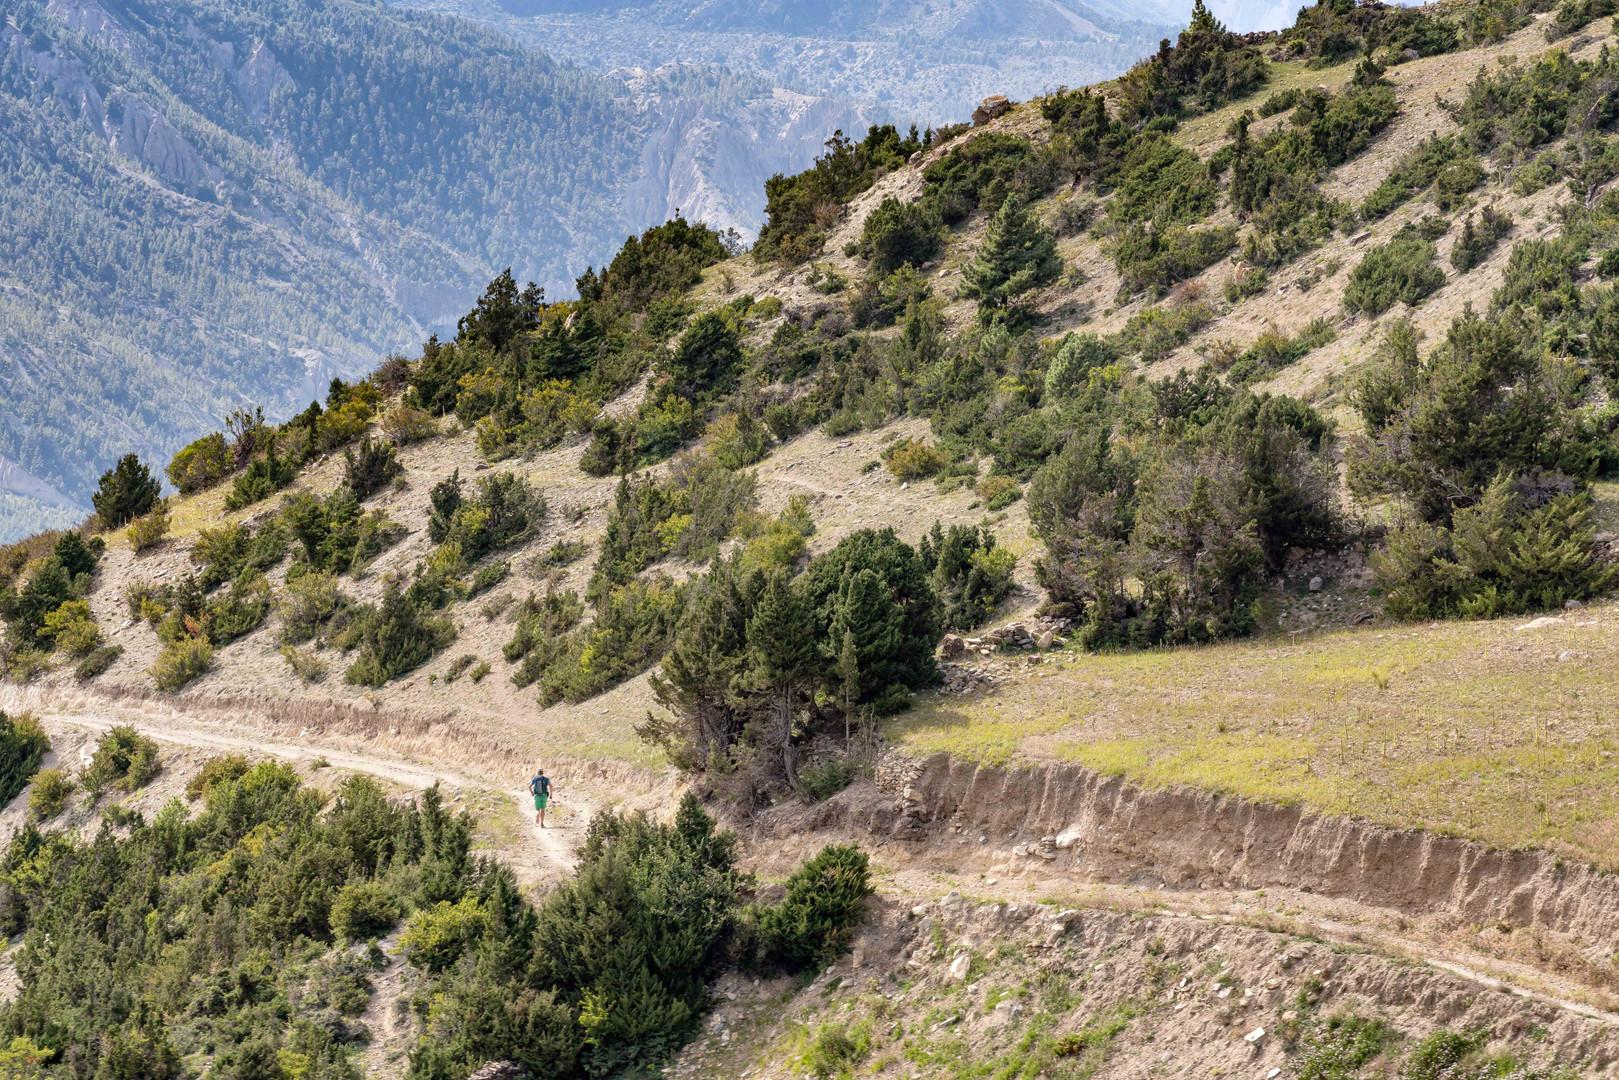 Marco Corda running in the Himalaya